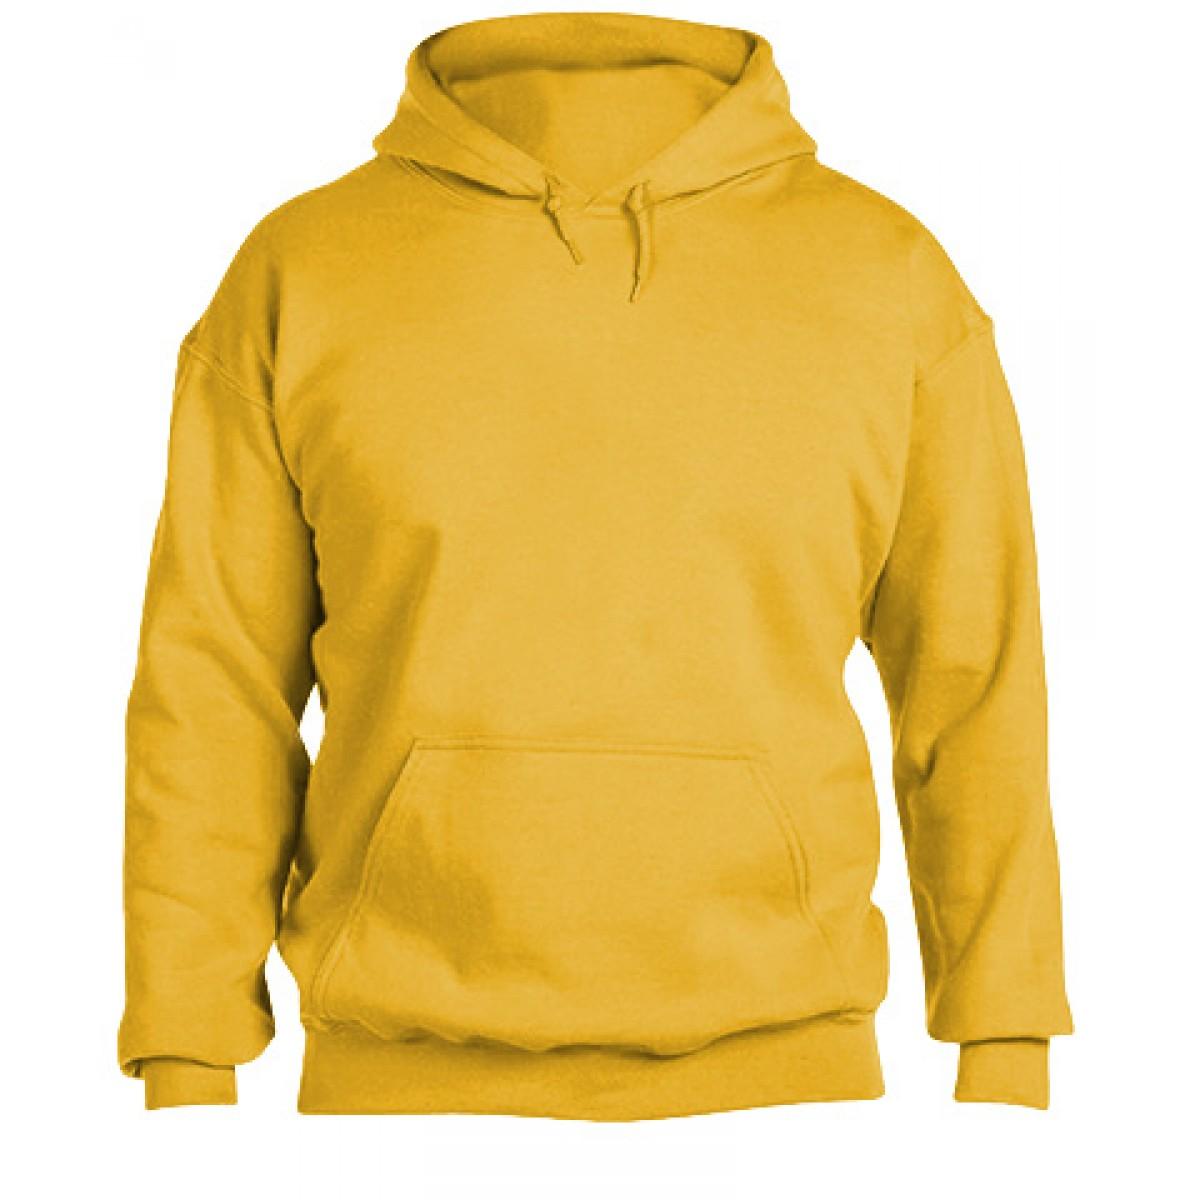 Hooded Sweatshirt 50/50 Heavy Blend -Gold-XL